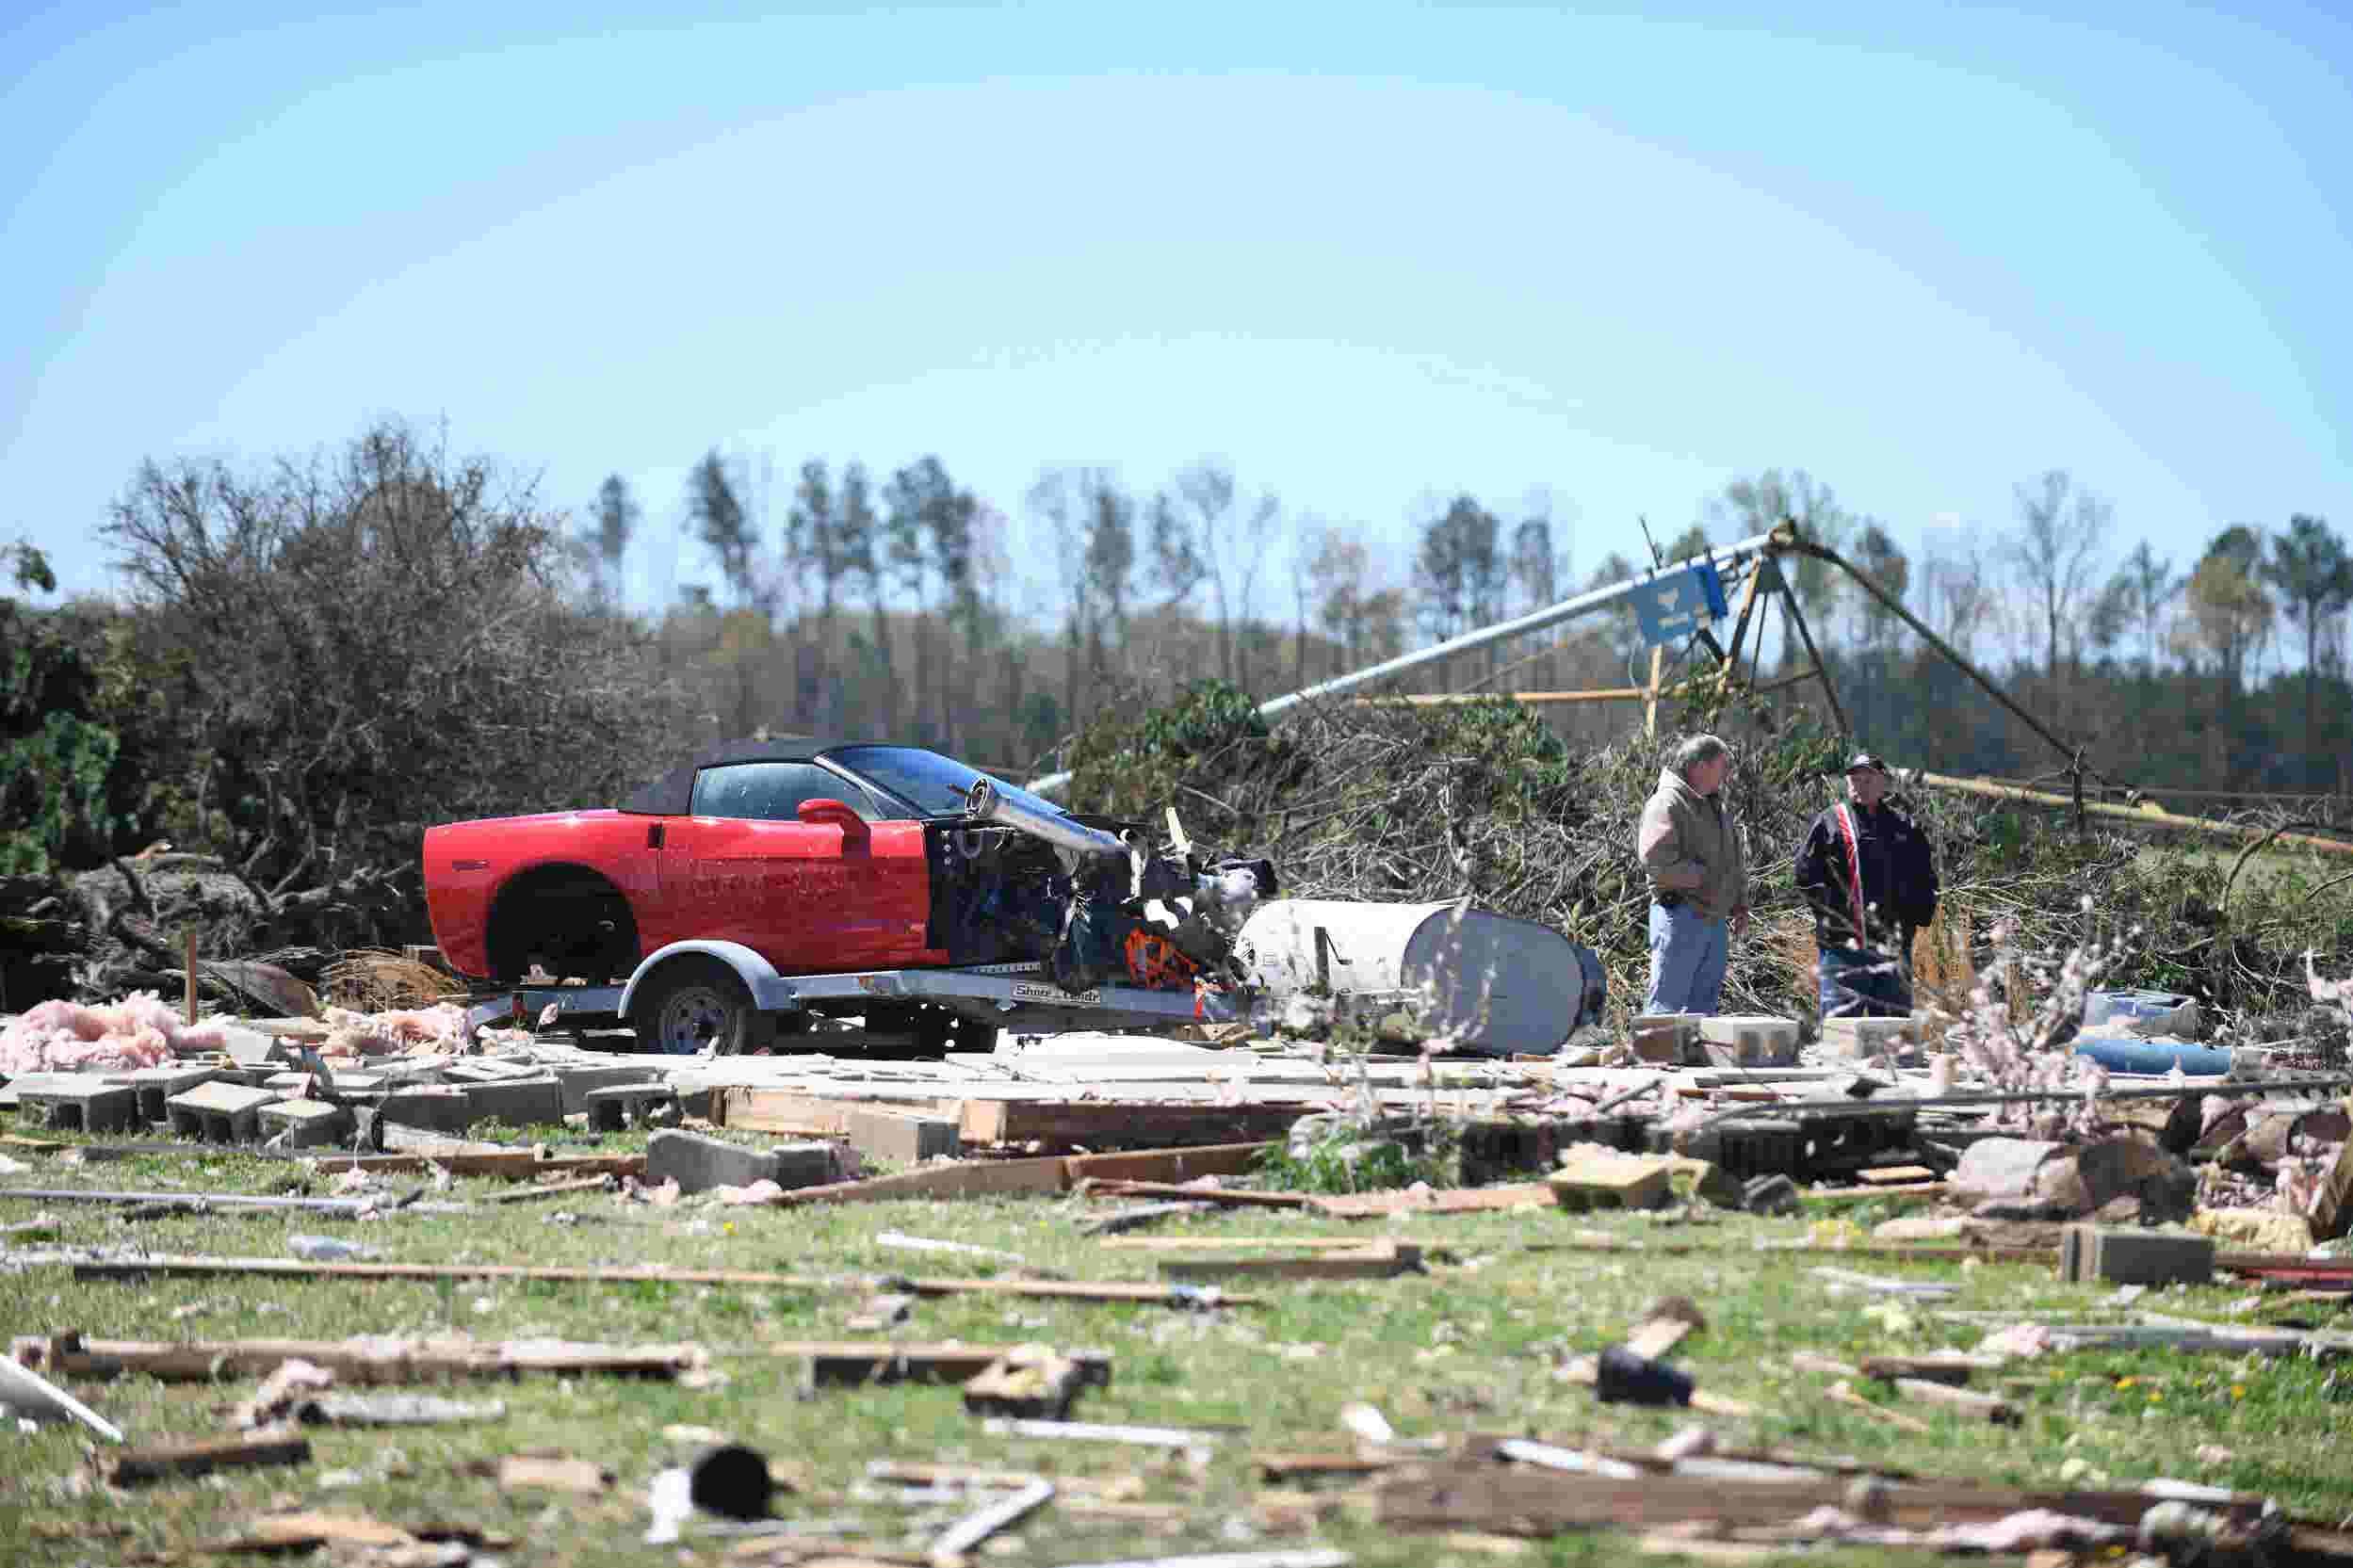 Third tornado confirmed on Delmarva: National Weather Service